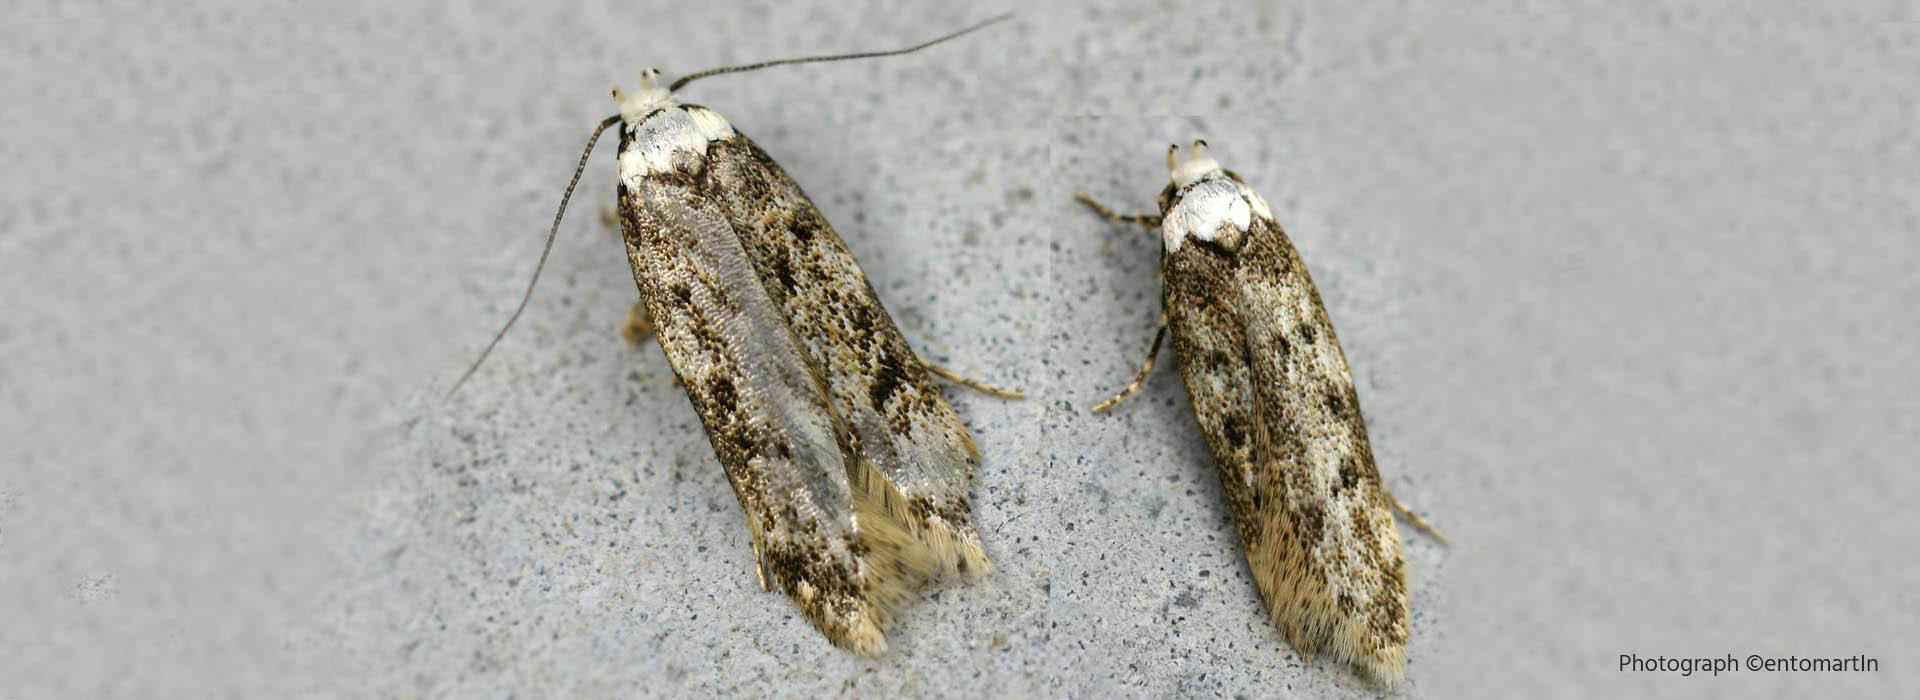 Moth Control - MICROBEE Environmental - Pest Control H01a